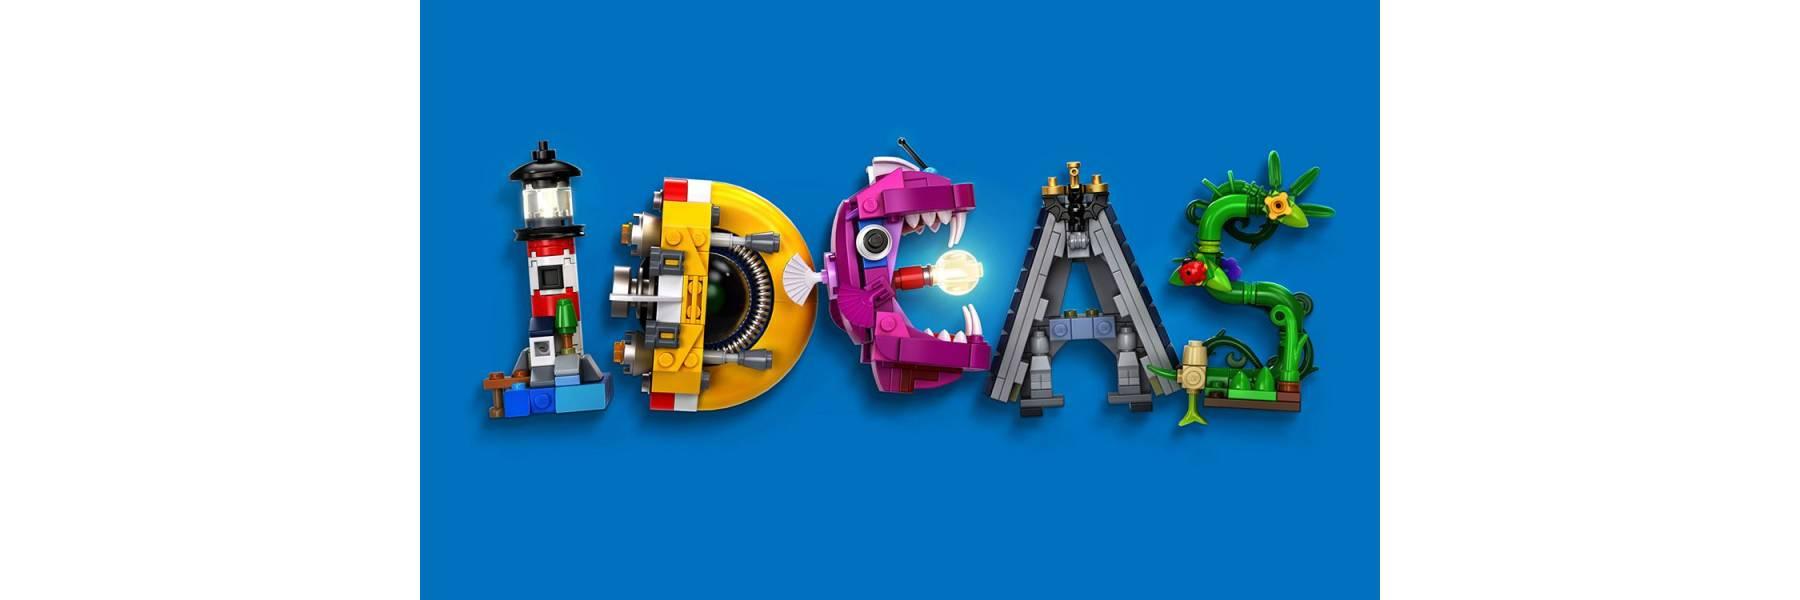 LEGO , δημιούργησε και εσύ!!Βάλε φαντασία και φτίαξε την δική σου πόλη!!